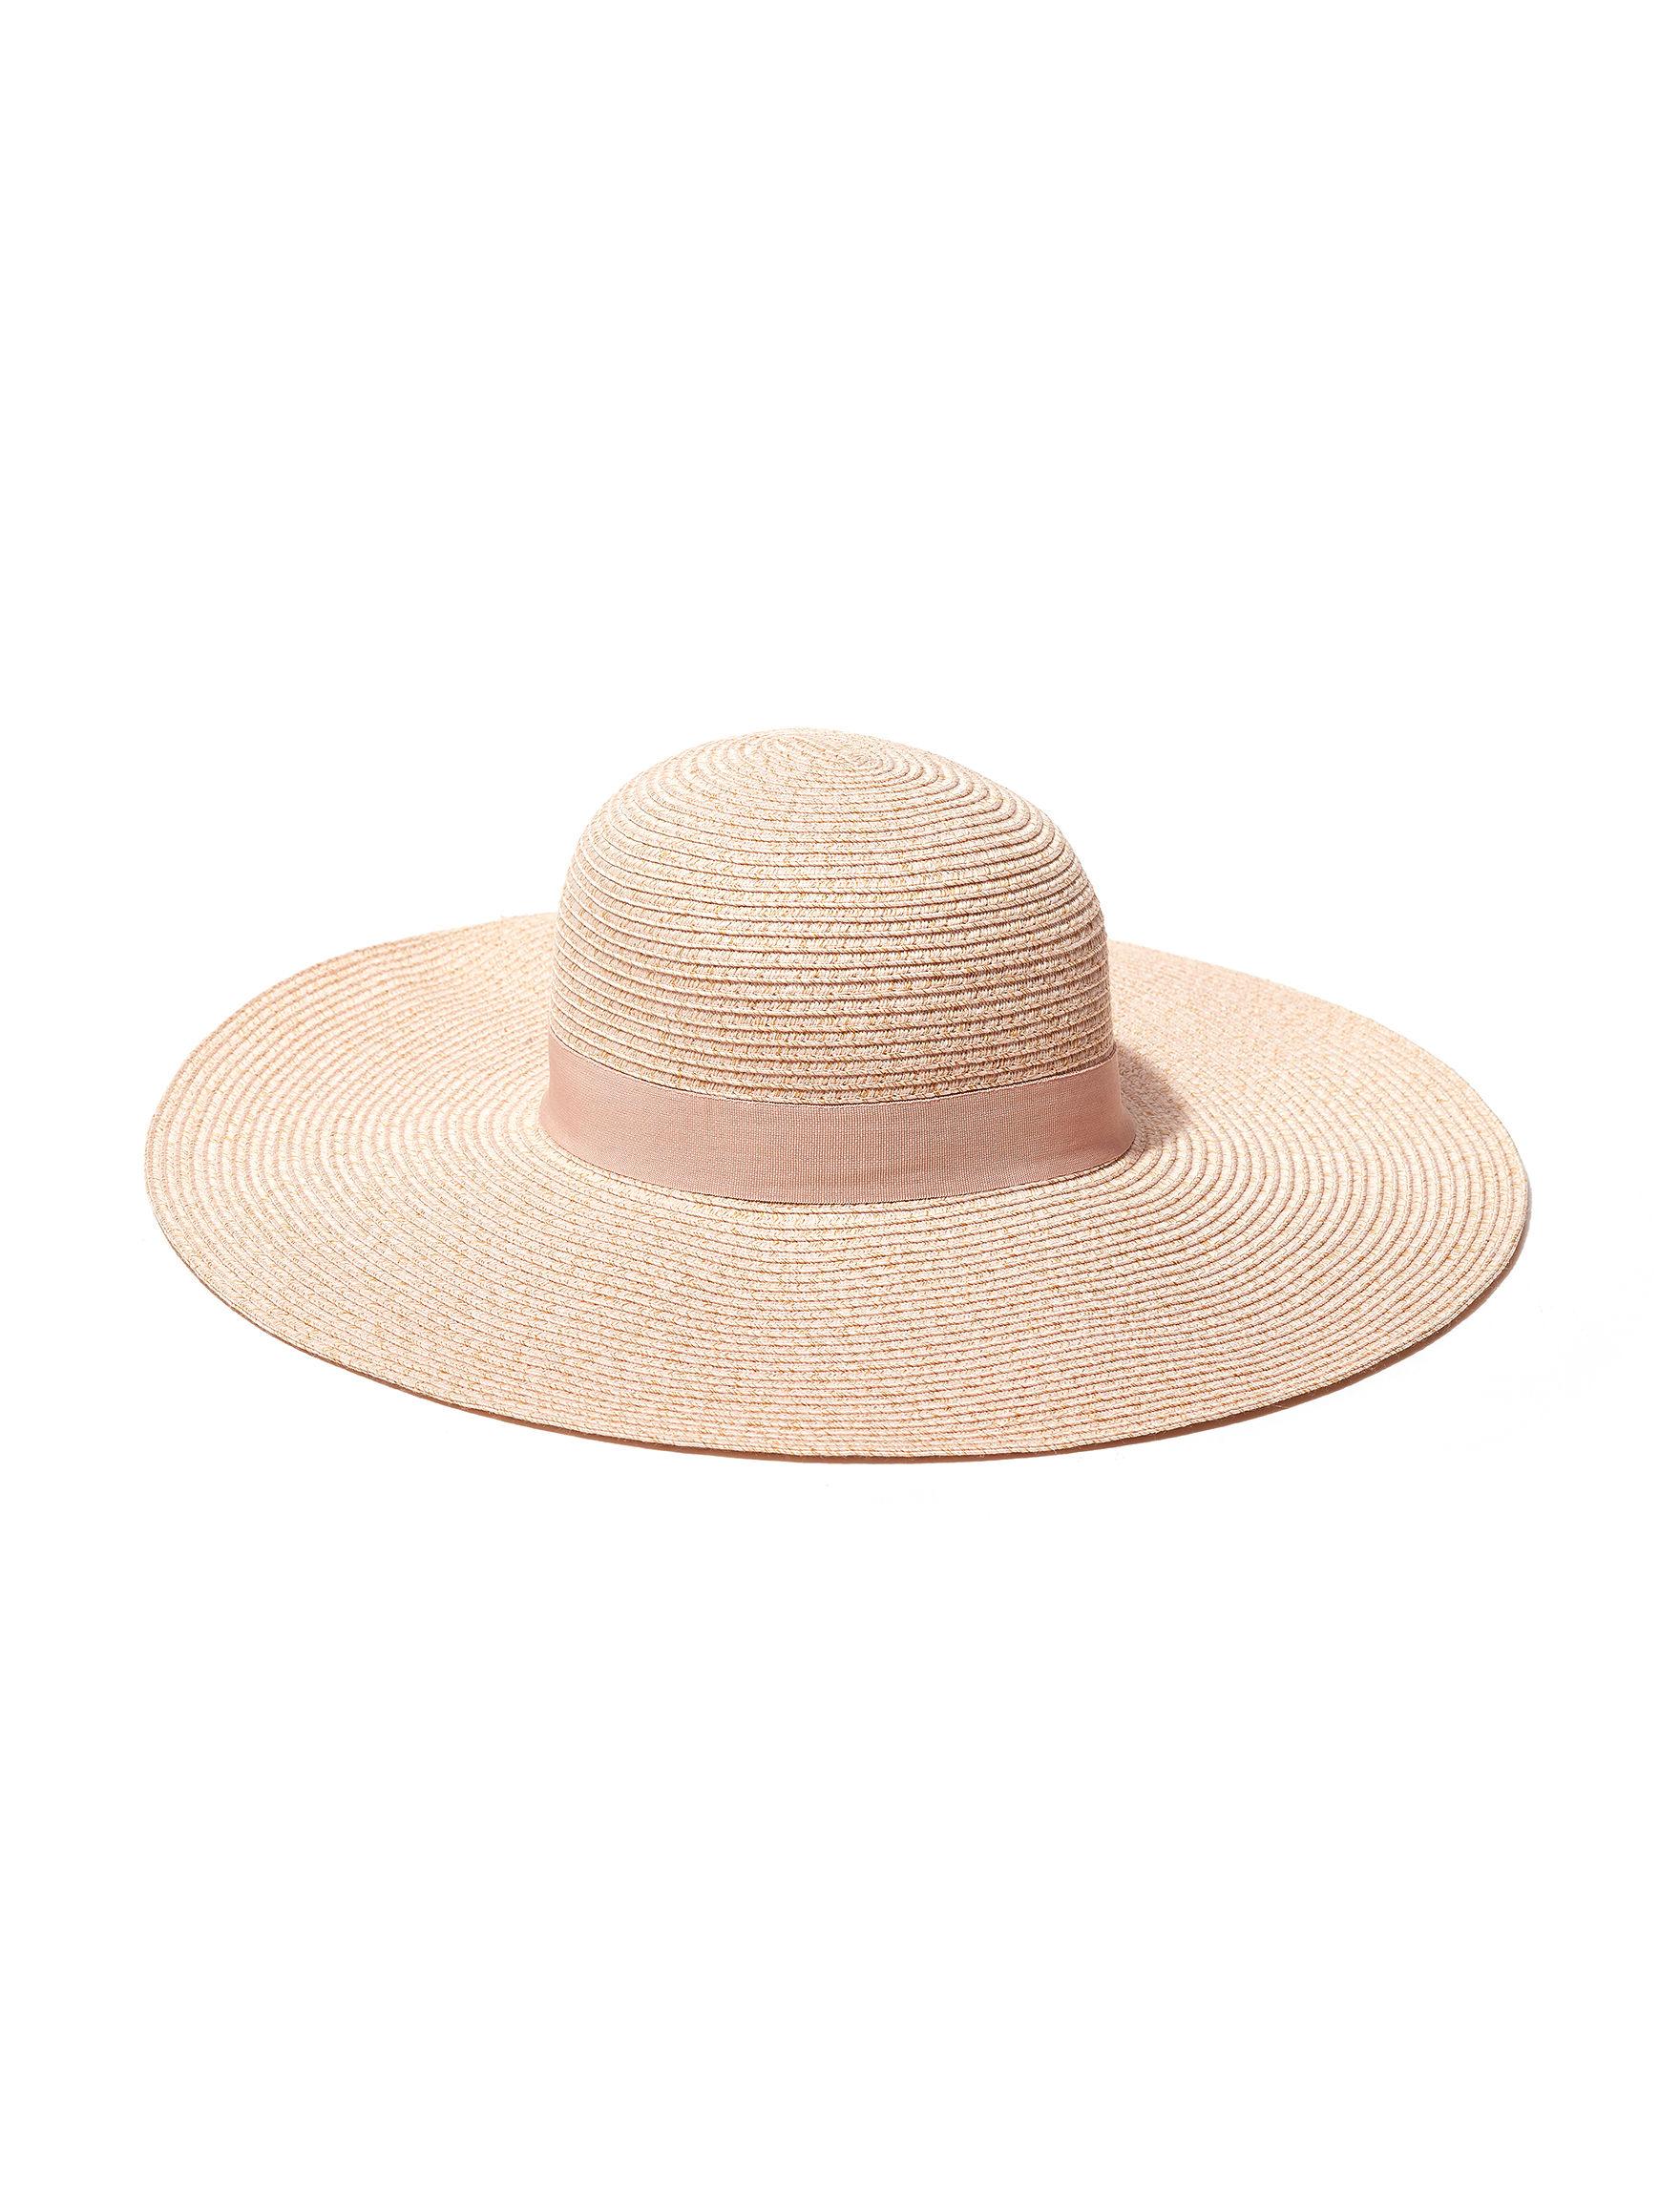 David & Young Pale Pink Hats & Headwear